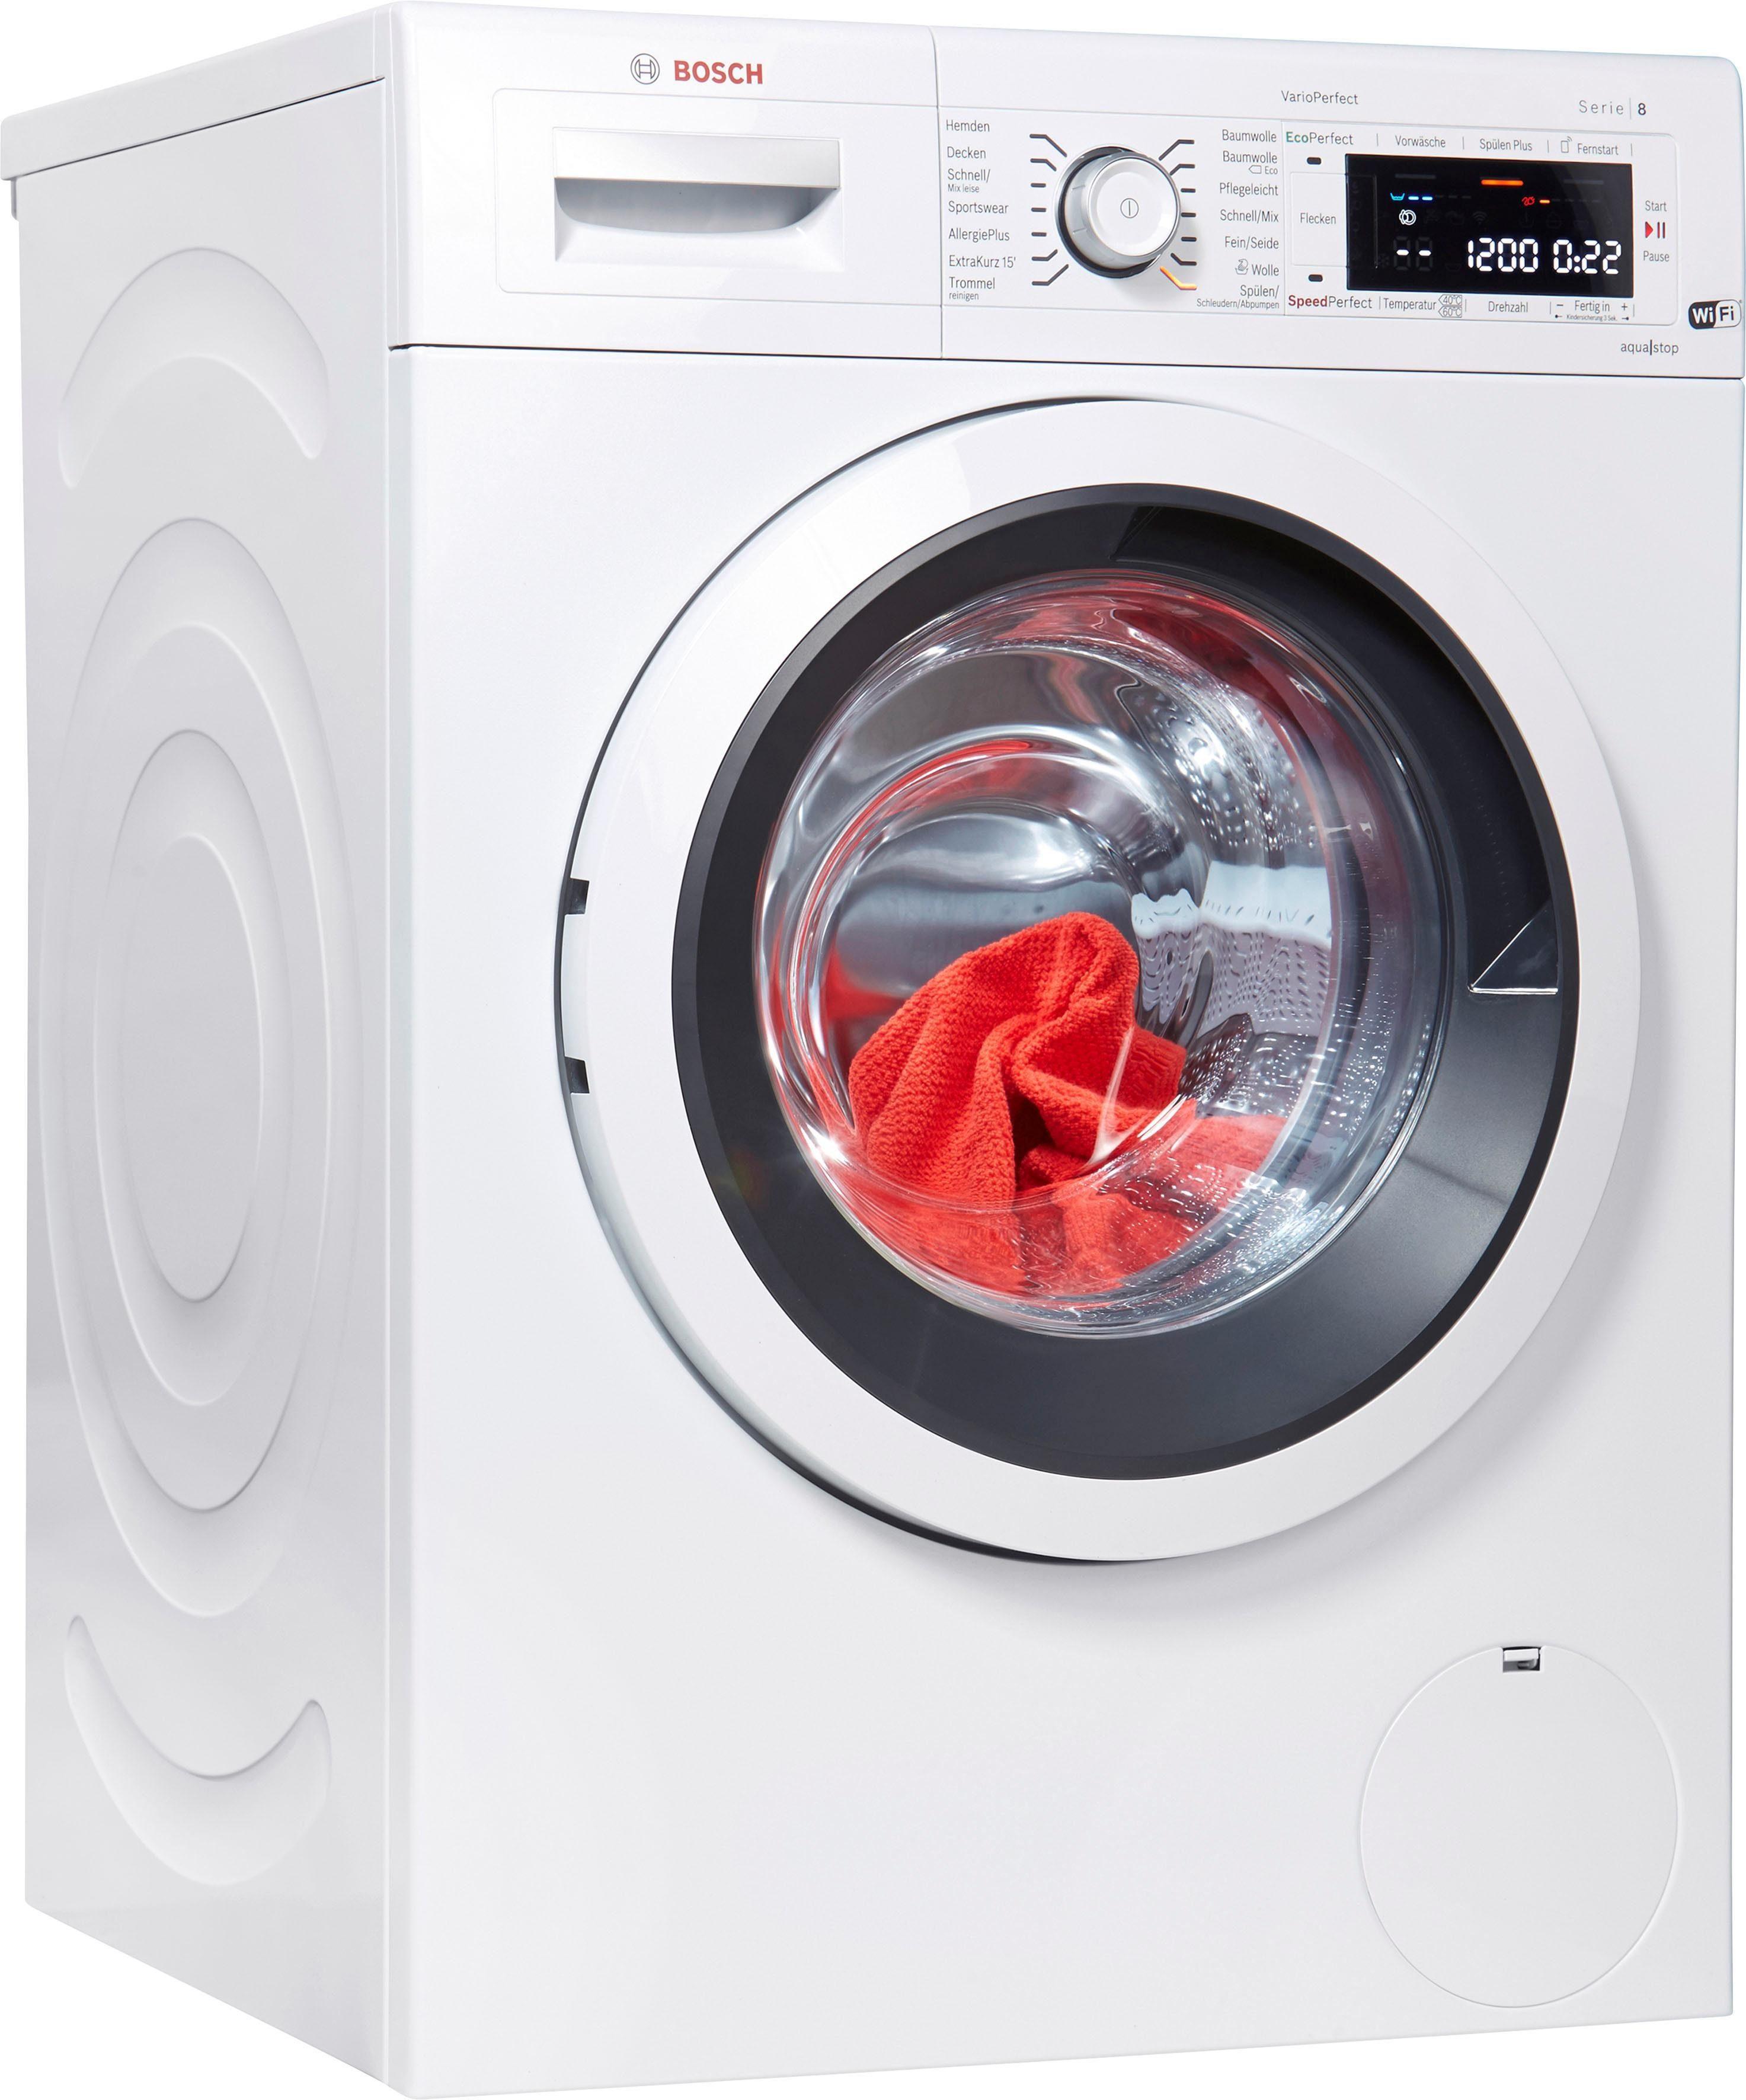 BOSCH Waschmaschine Serie 8 WAWH8550, 8 kg, 1400 U/Min